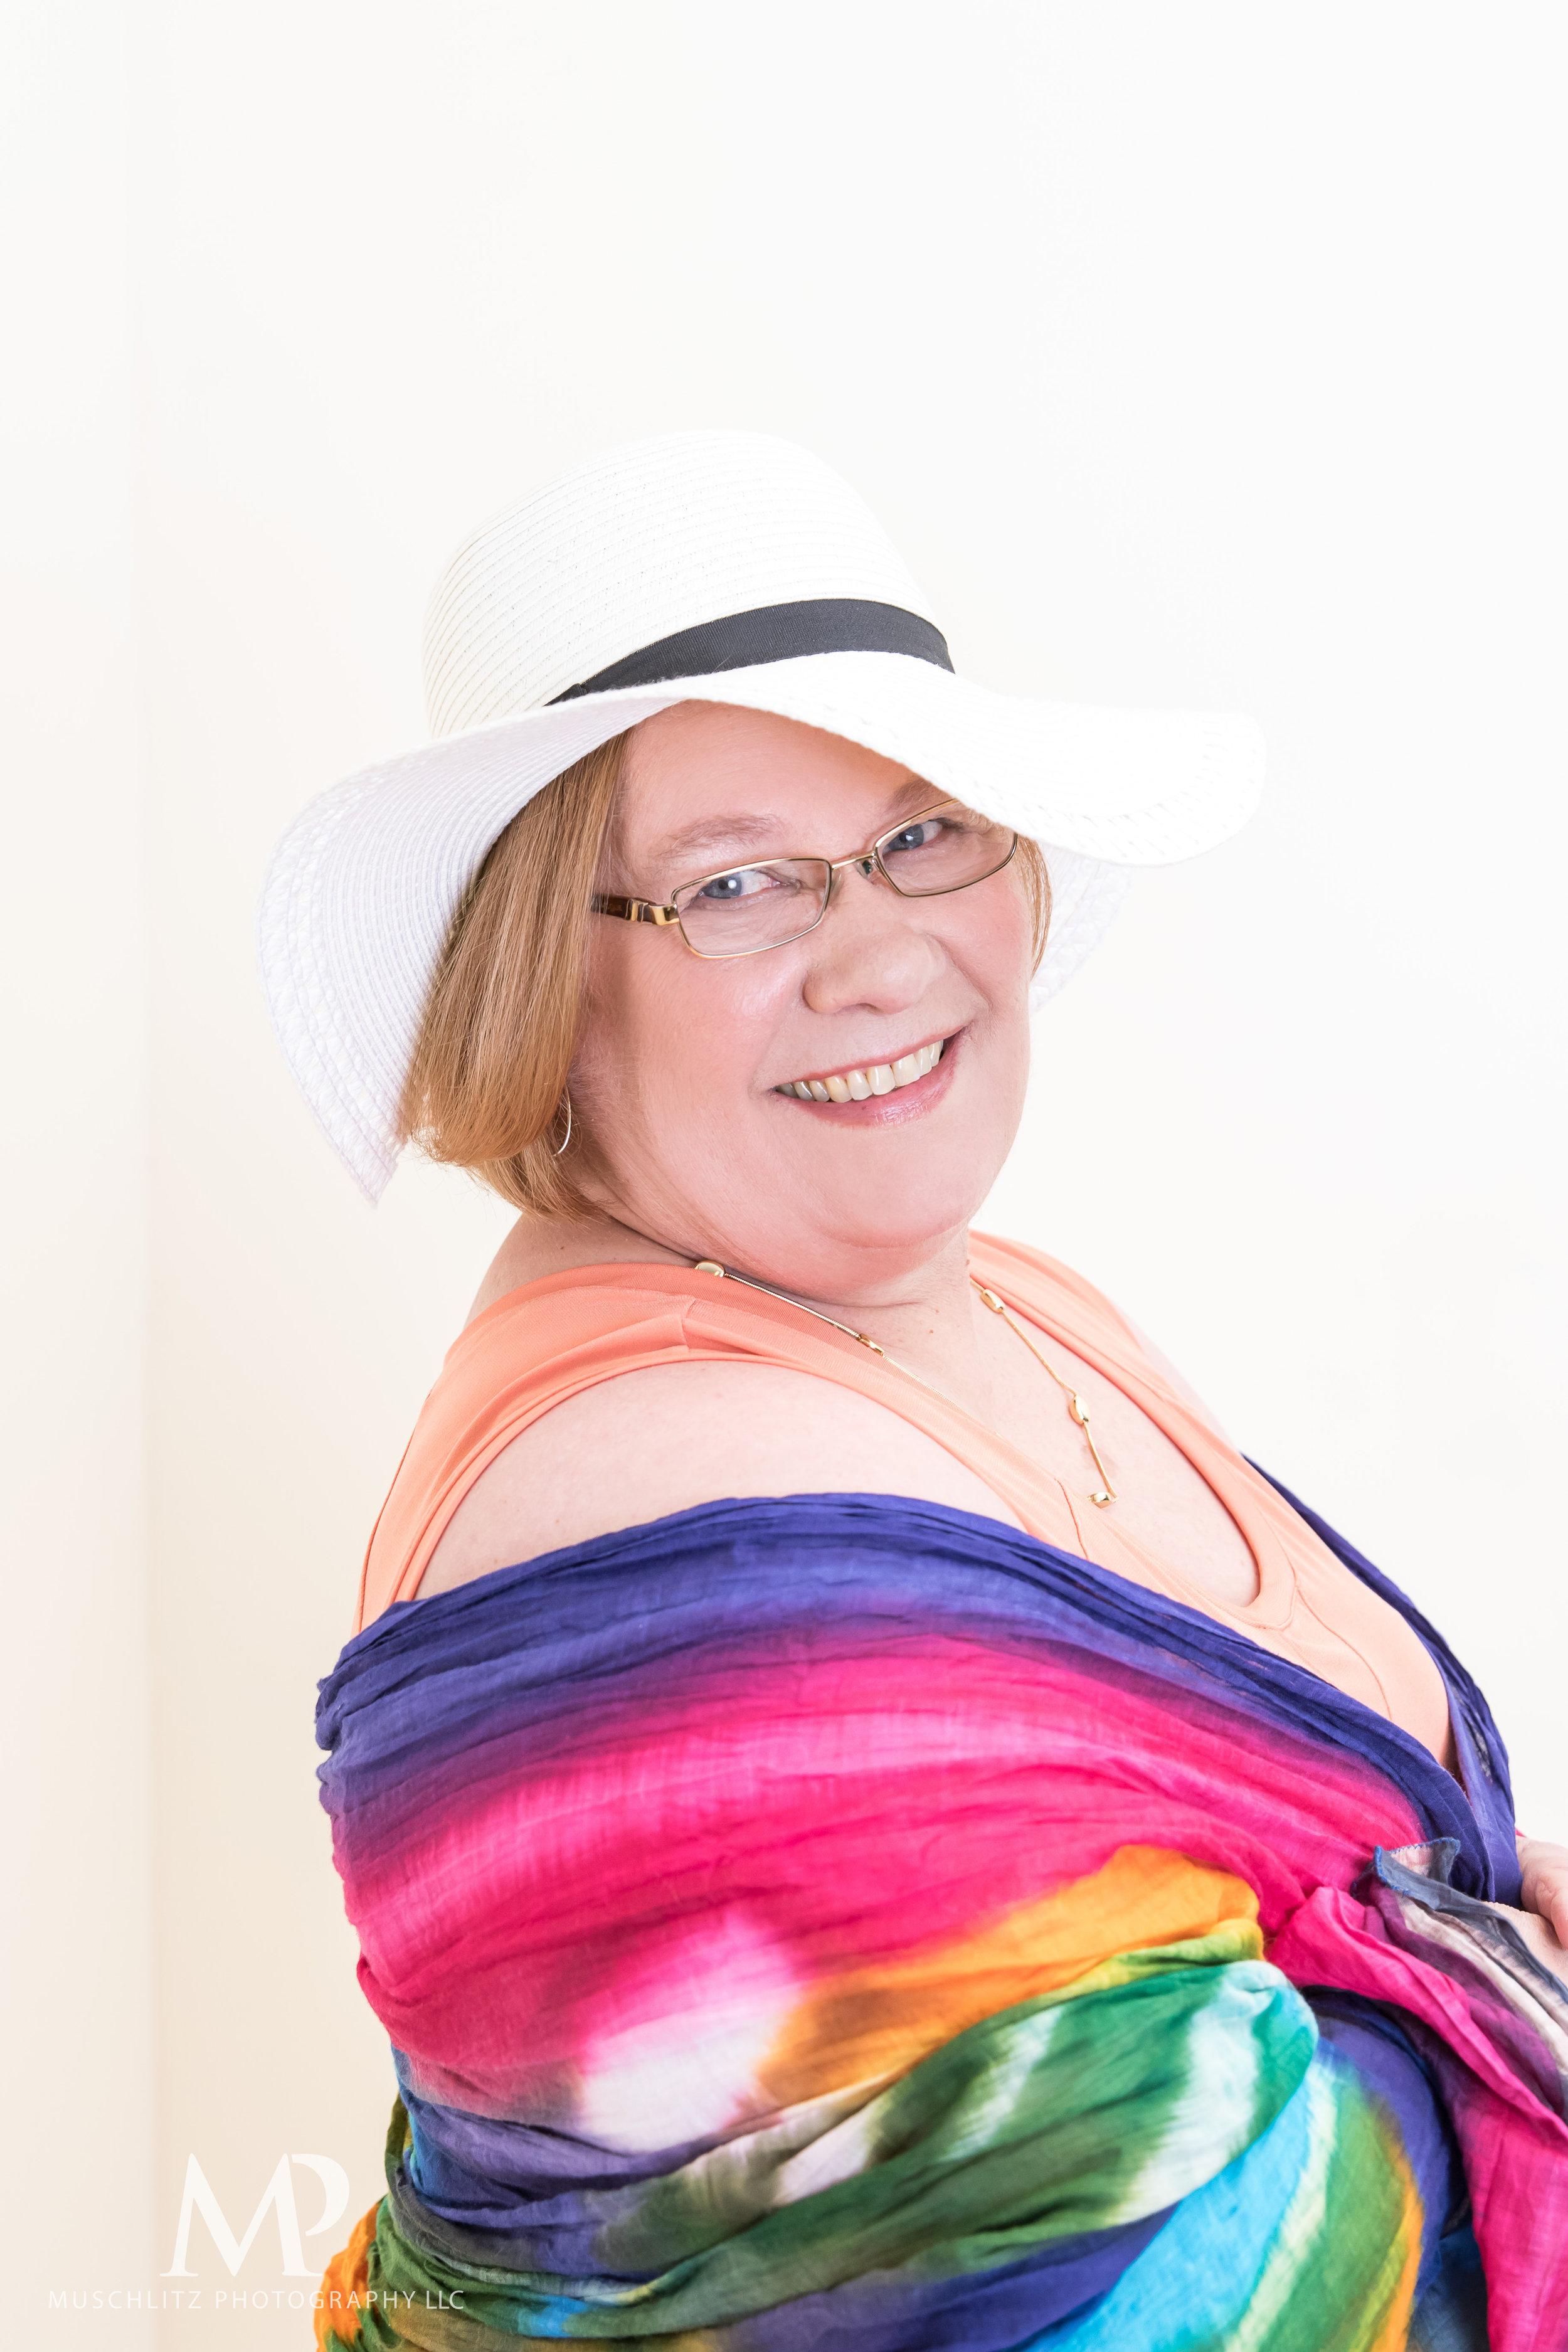 beauty-glamour-65-birthday-portrait-session-portraits-columbus-ohio-muschlitz-photography-034.JPG